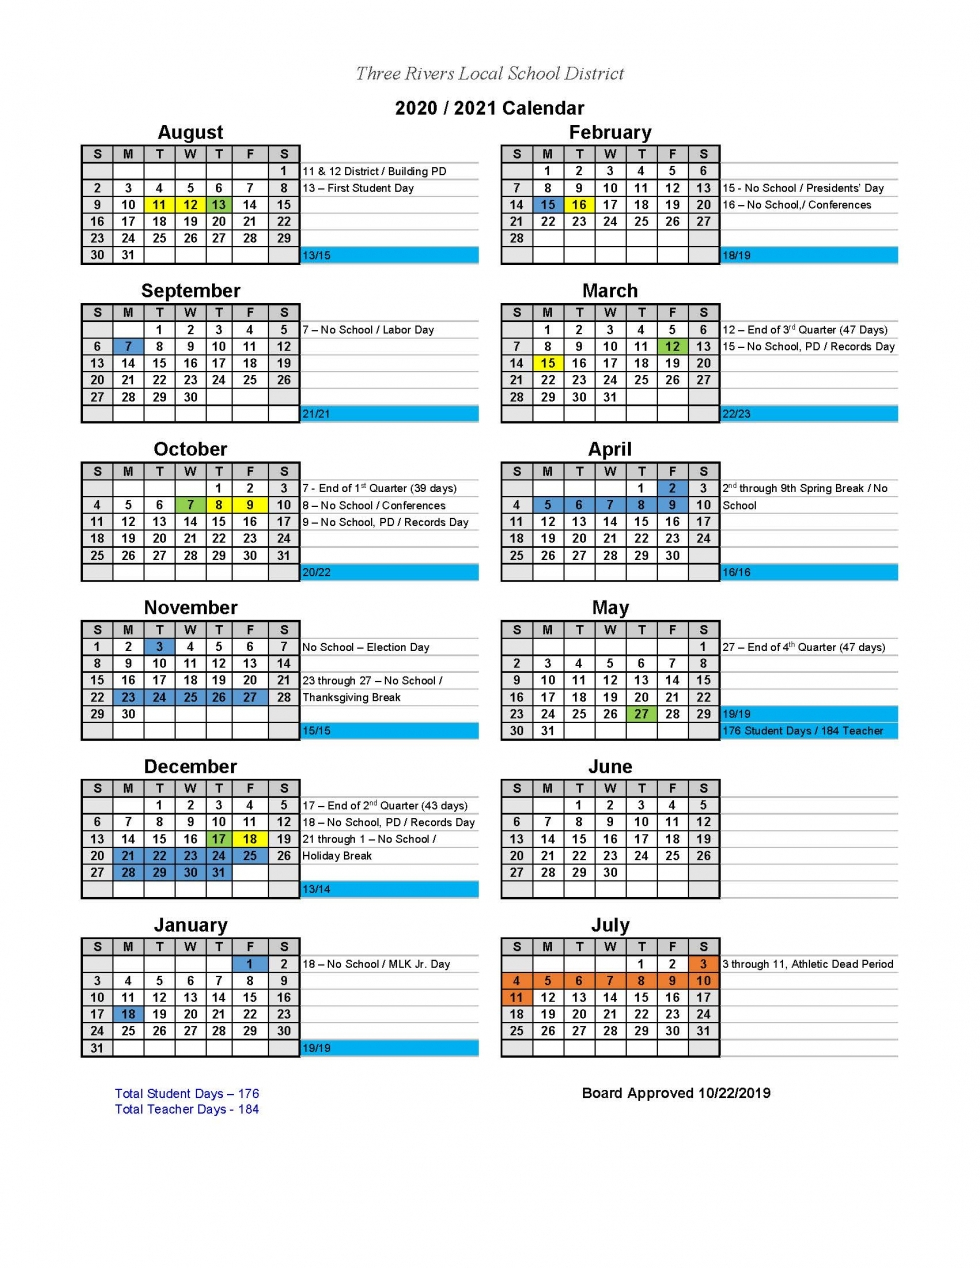 Three Rivers Local School District – Calendars With Harrison School District 2 Calendar 2021